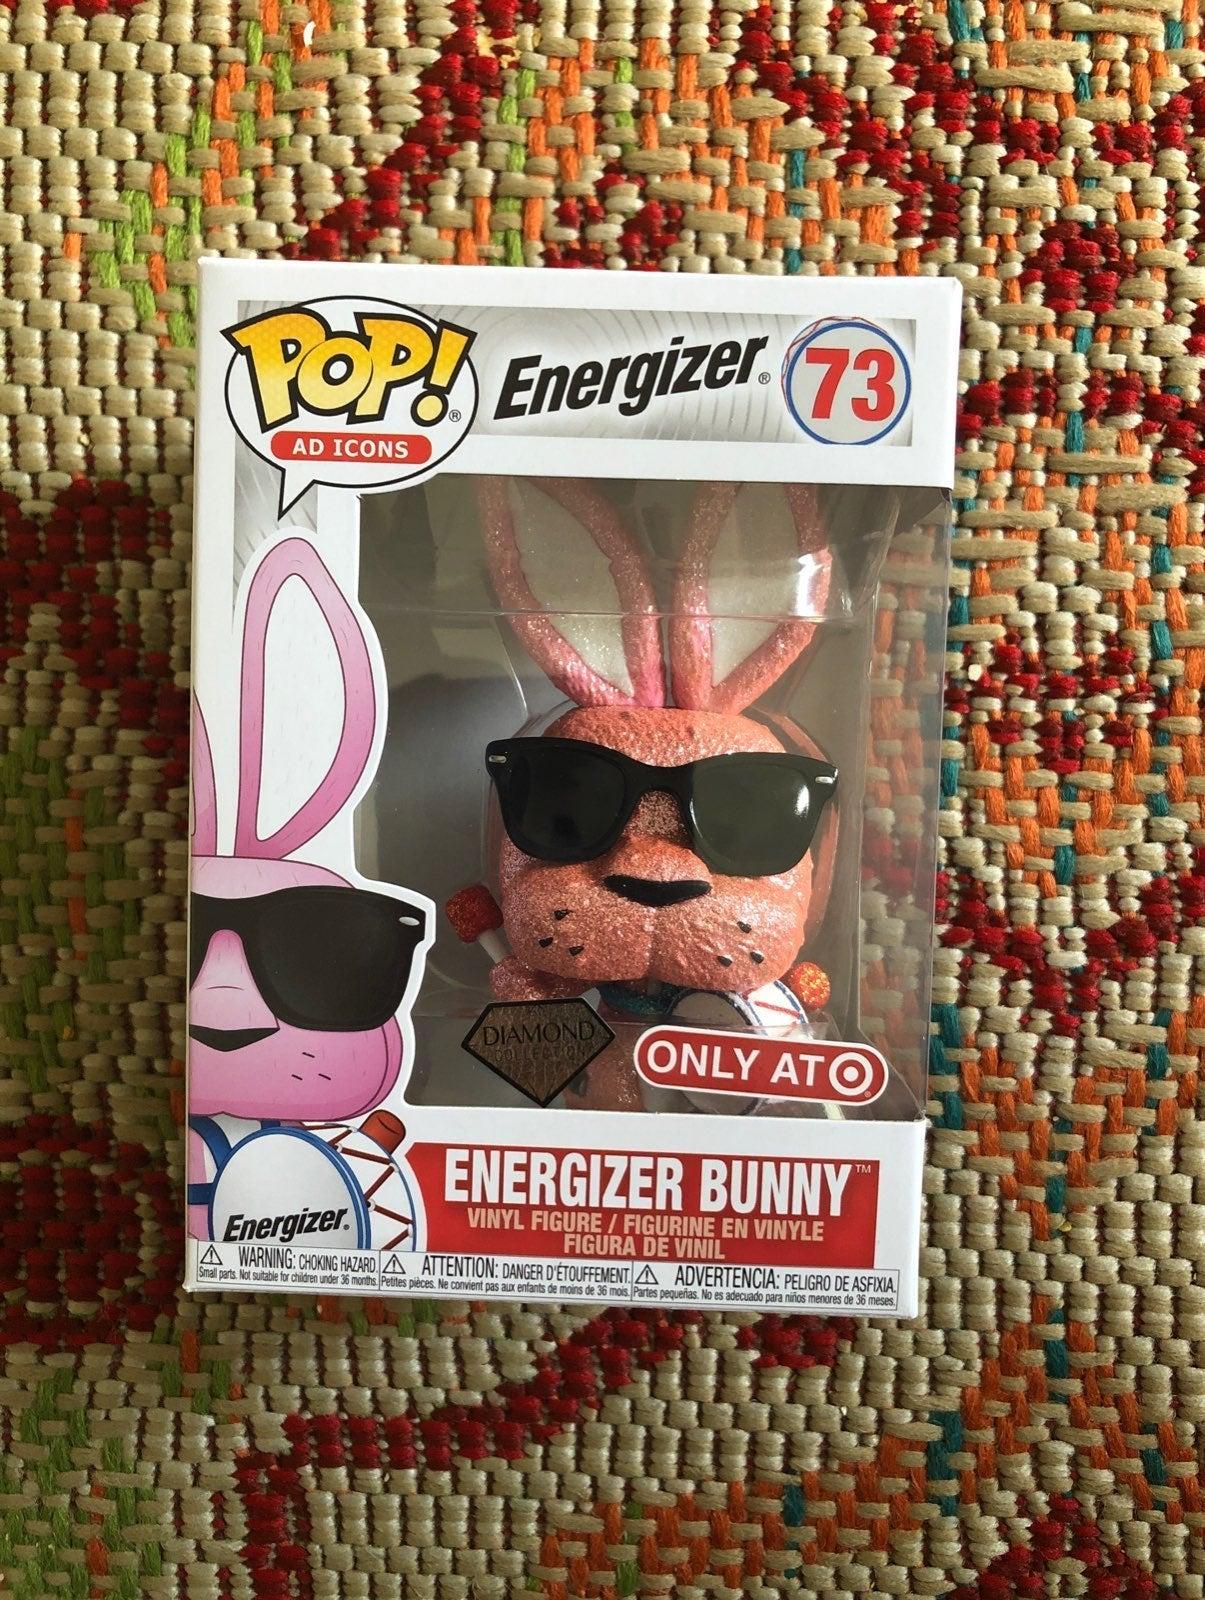 Funko Pop! Diamond Energizer Bunny